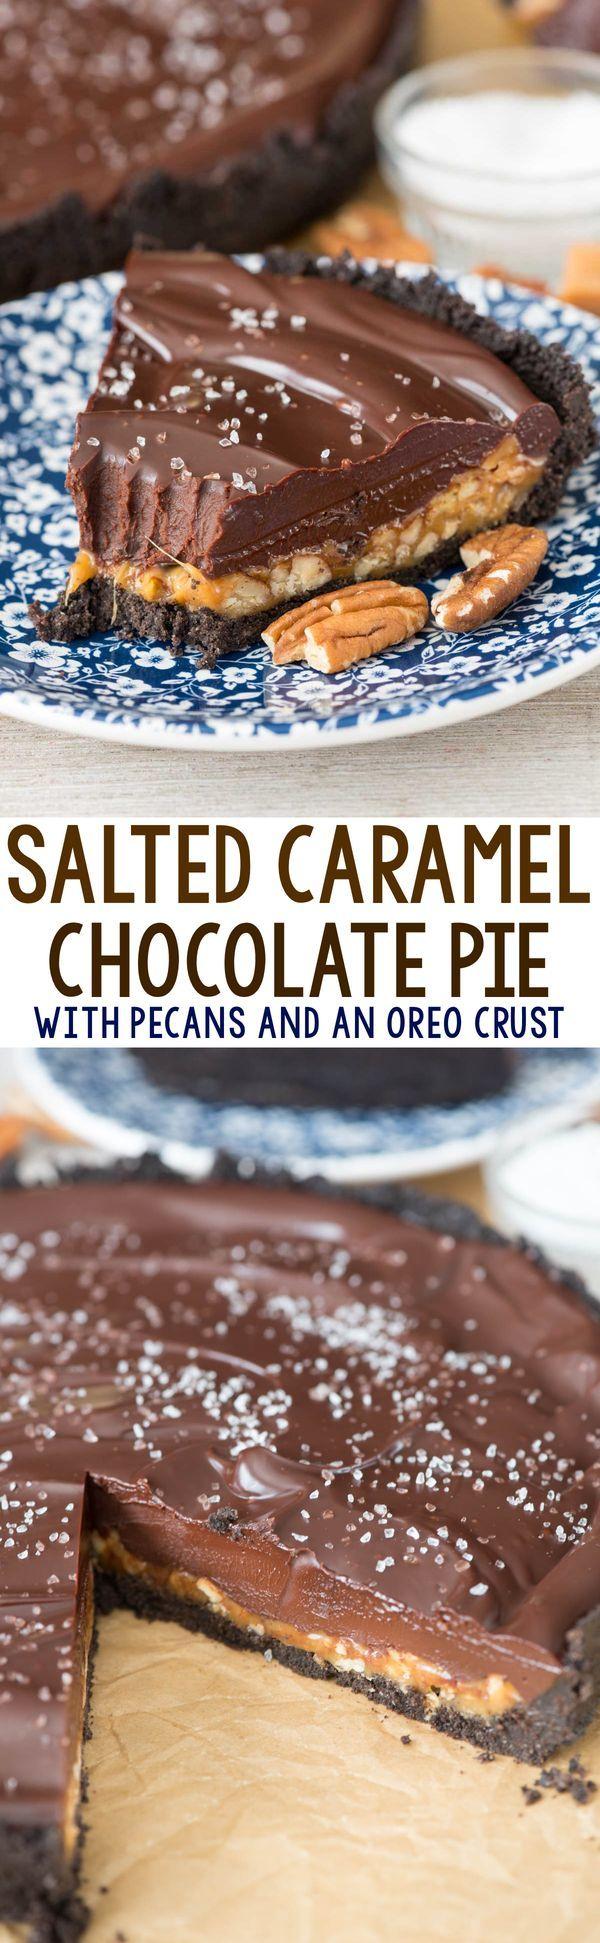 Salted Caramel Pecan Chocolate Pie